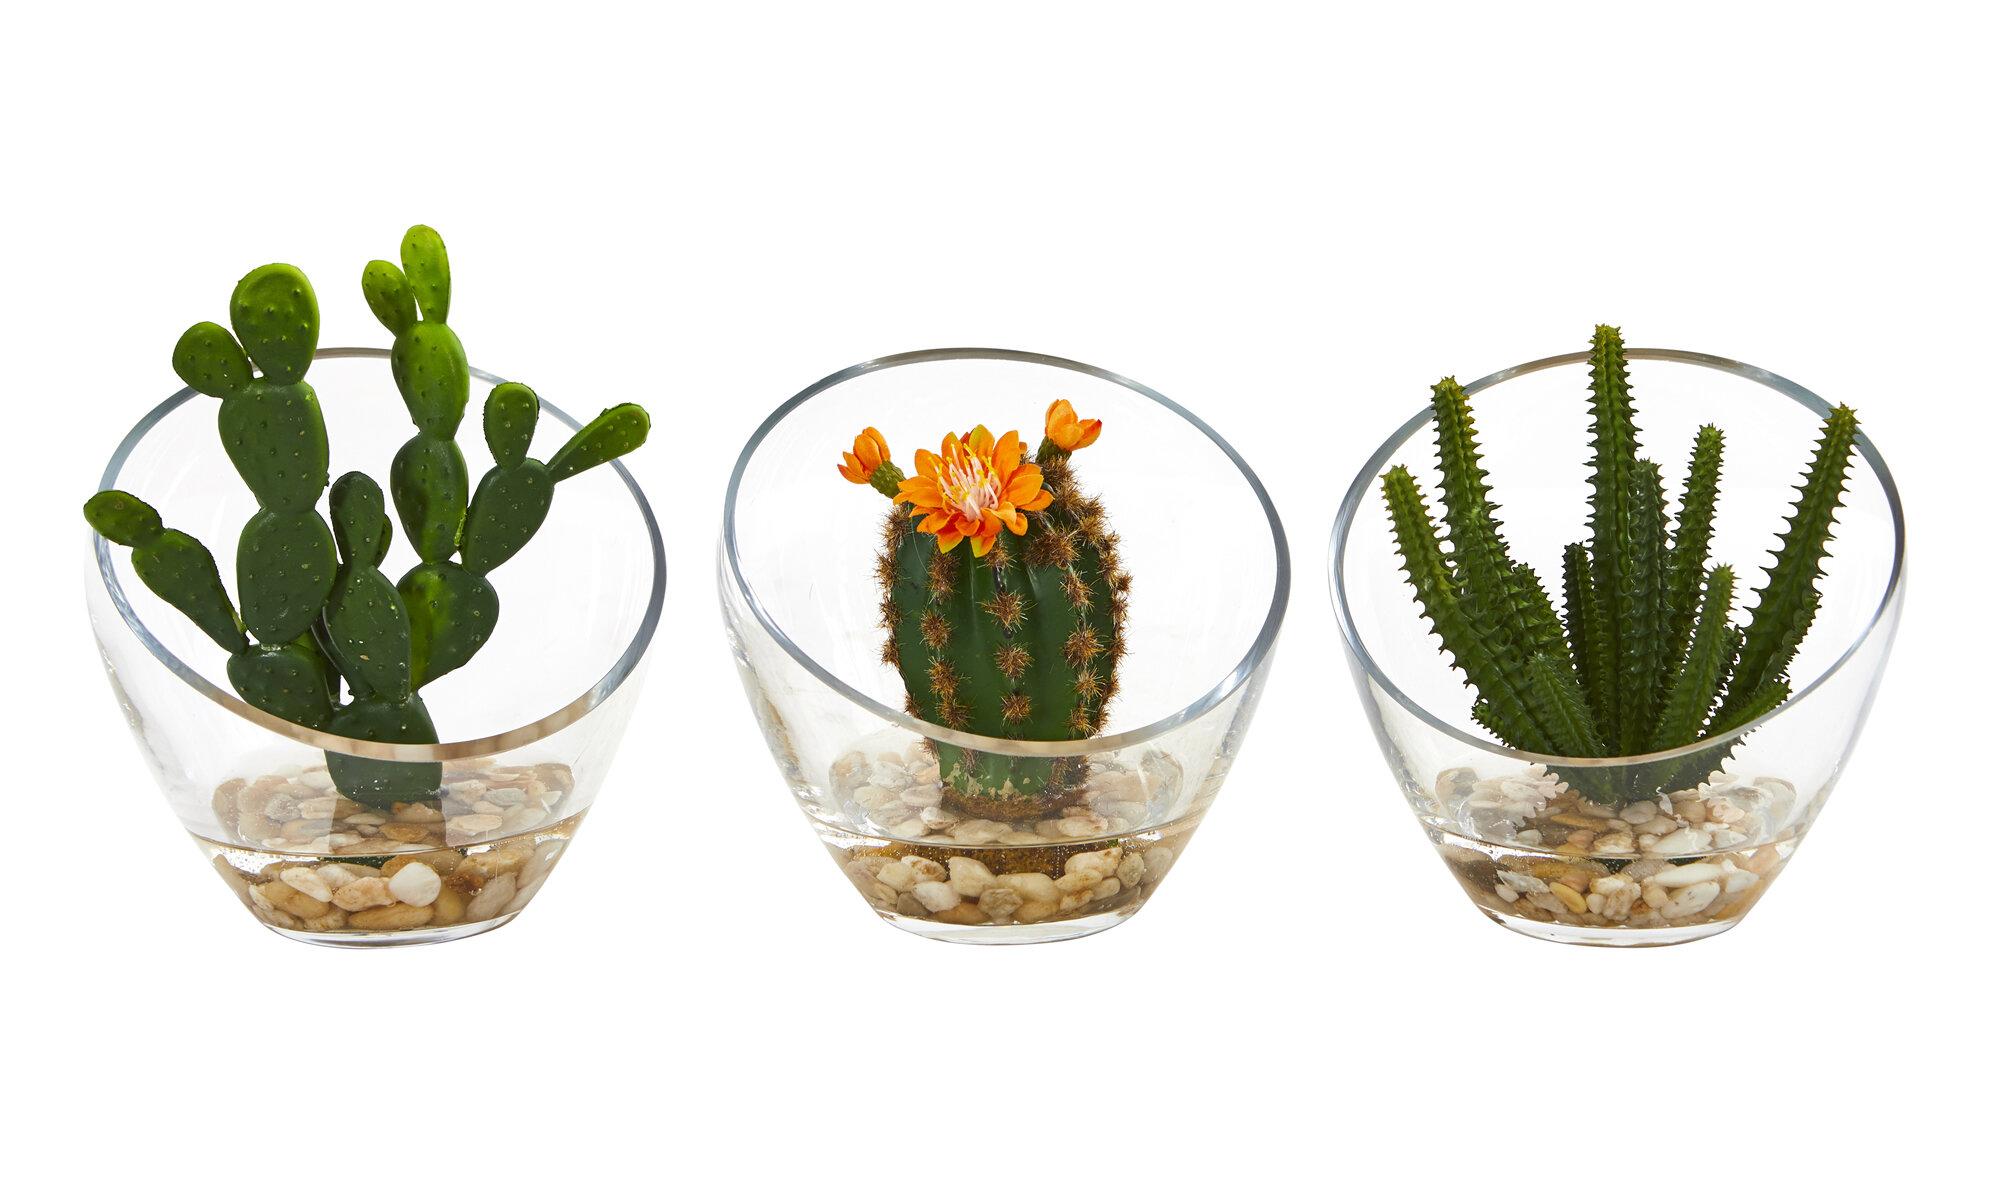 Primrue 3 Piece Mixed Artificial Cactus Succulent In Decorative Vase Set Wayfair